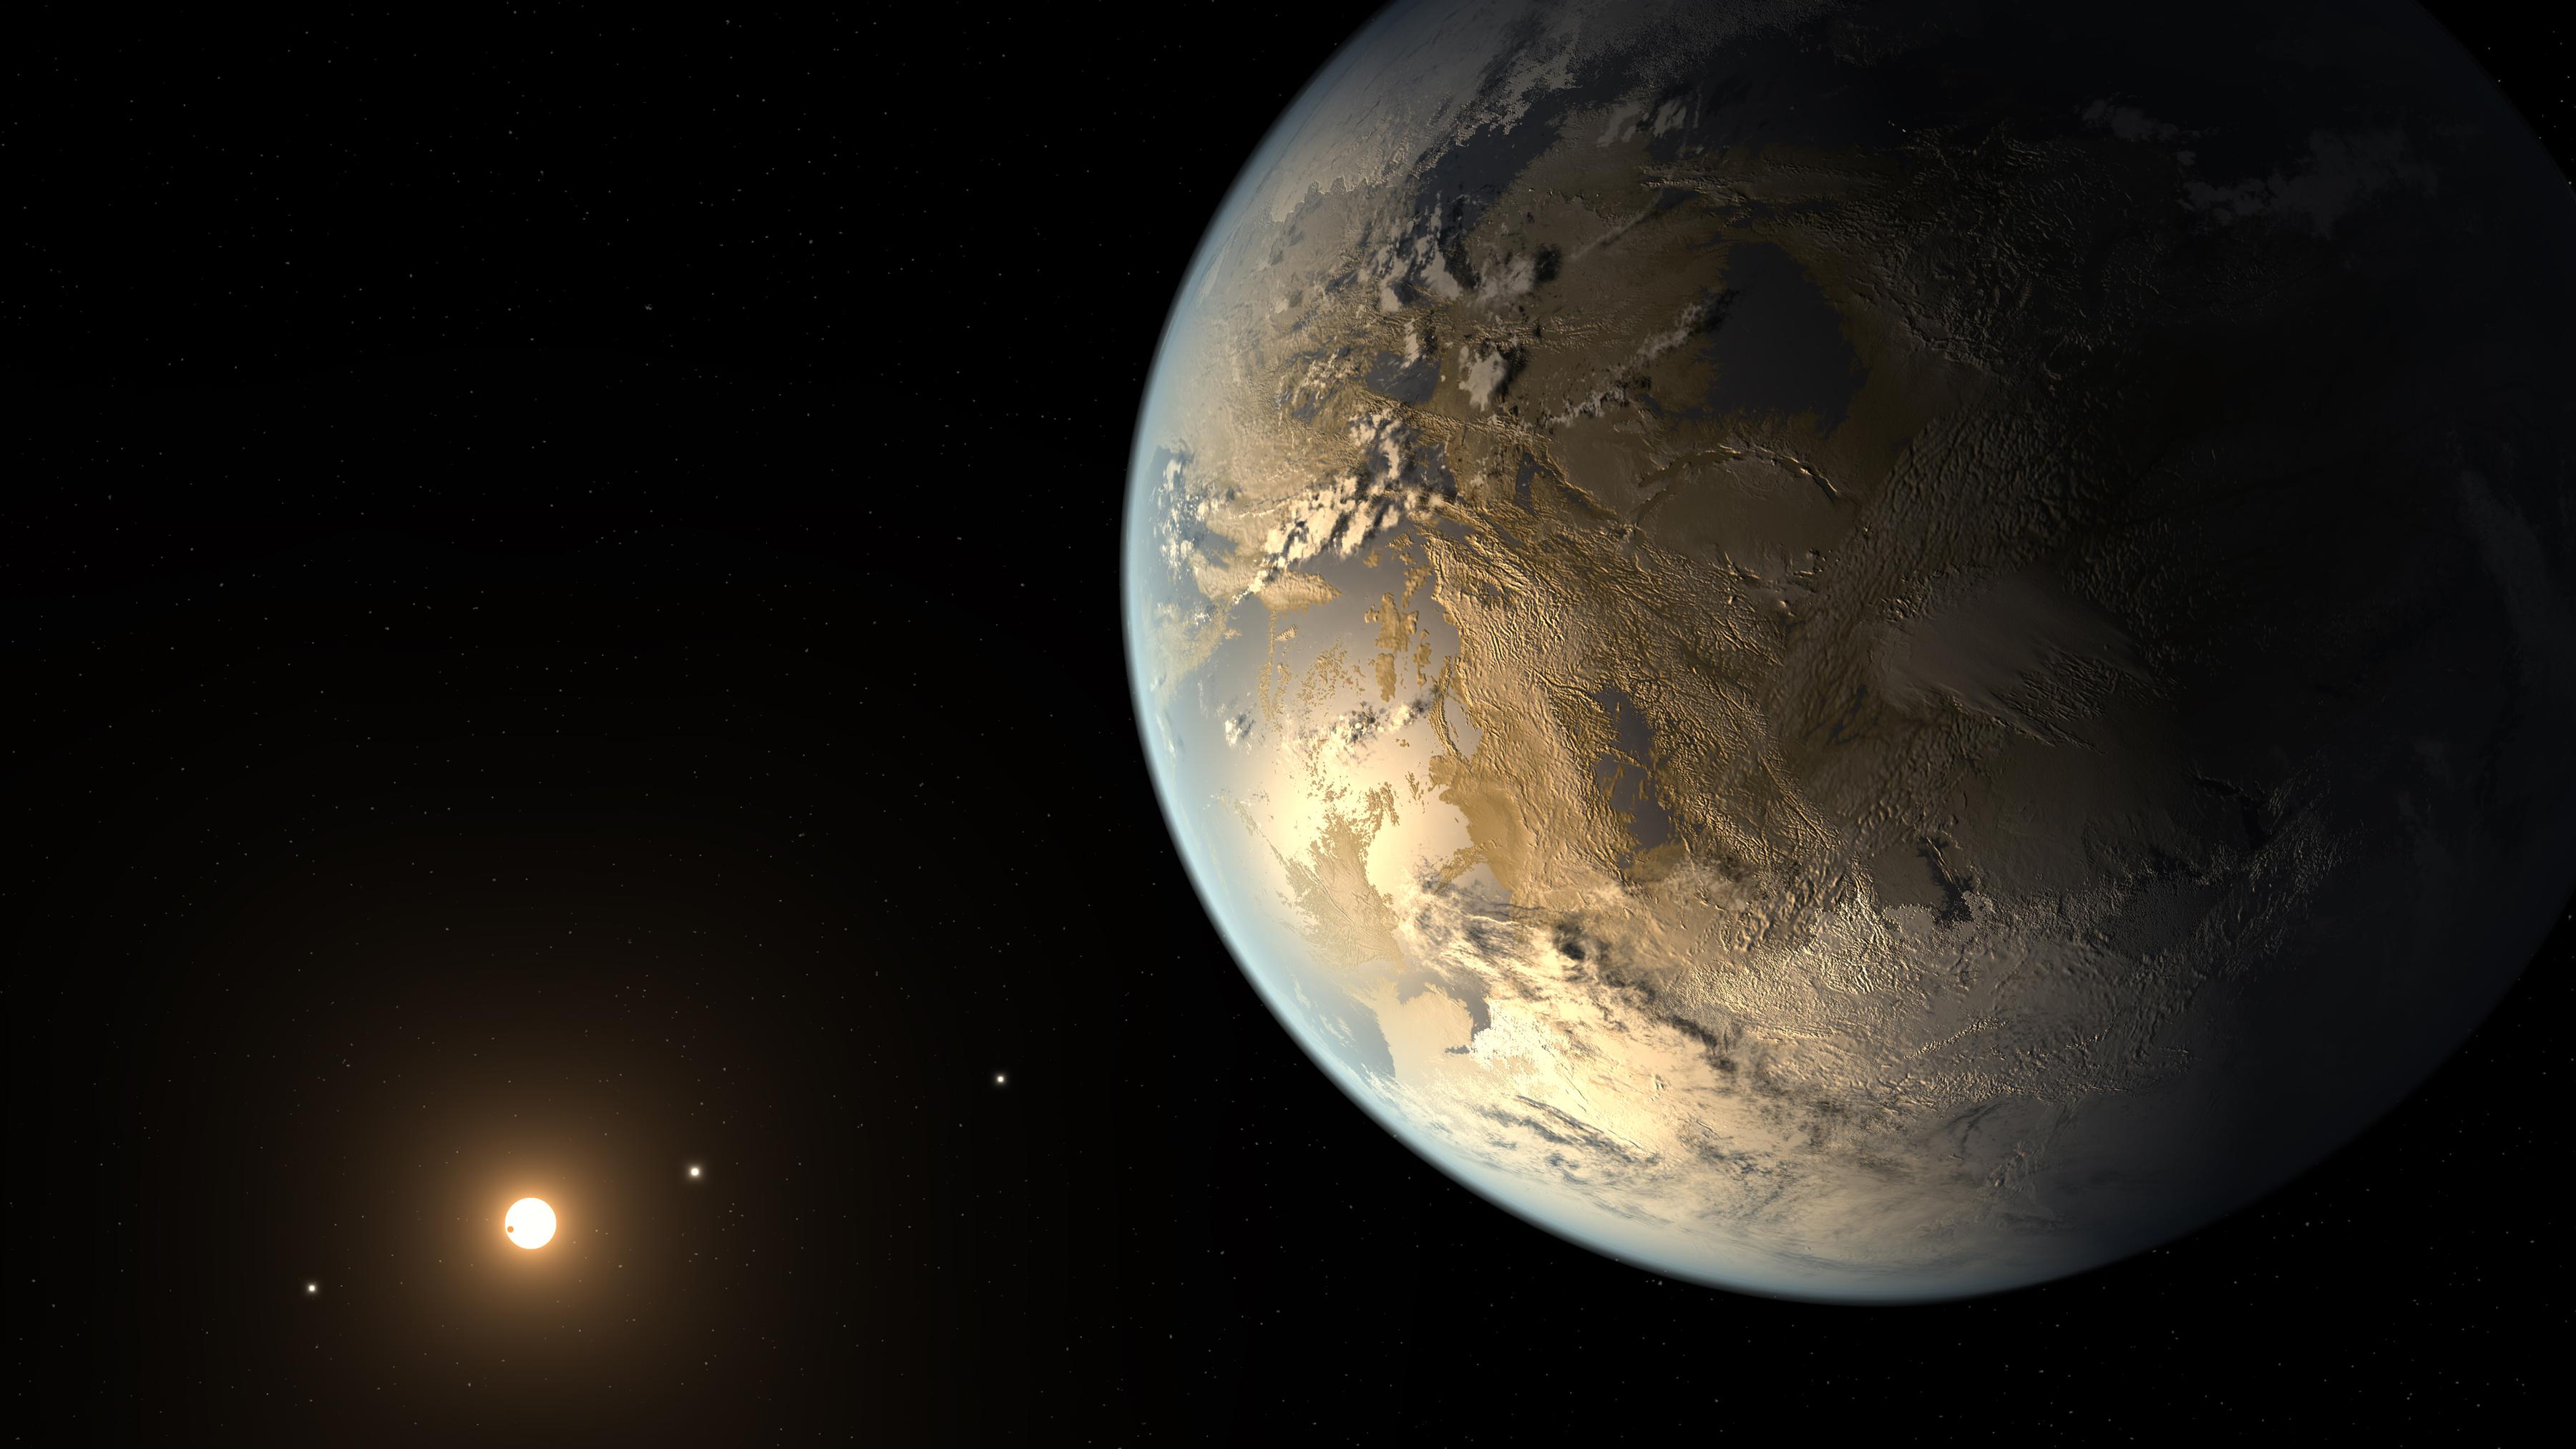 Drawn planets barren In planet habitable Kepler the